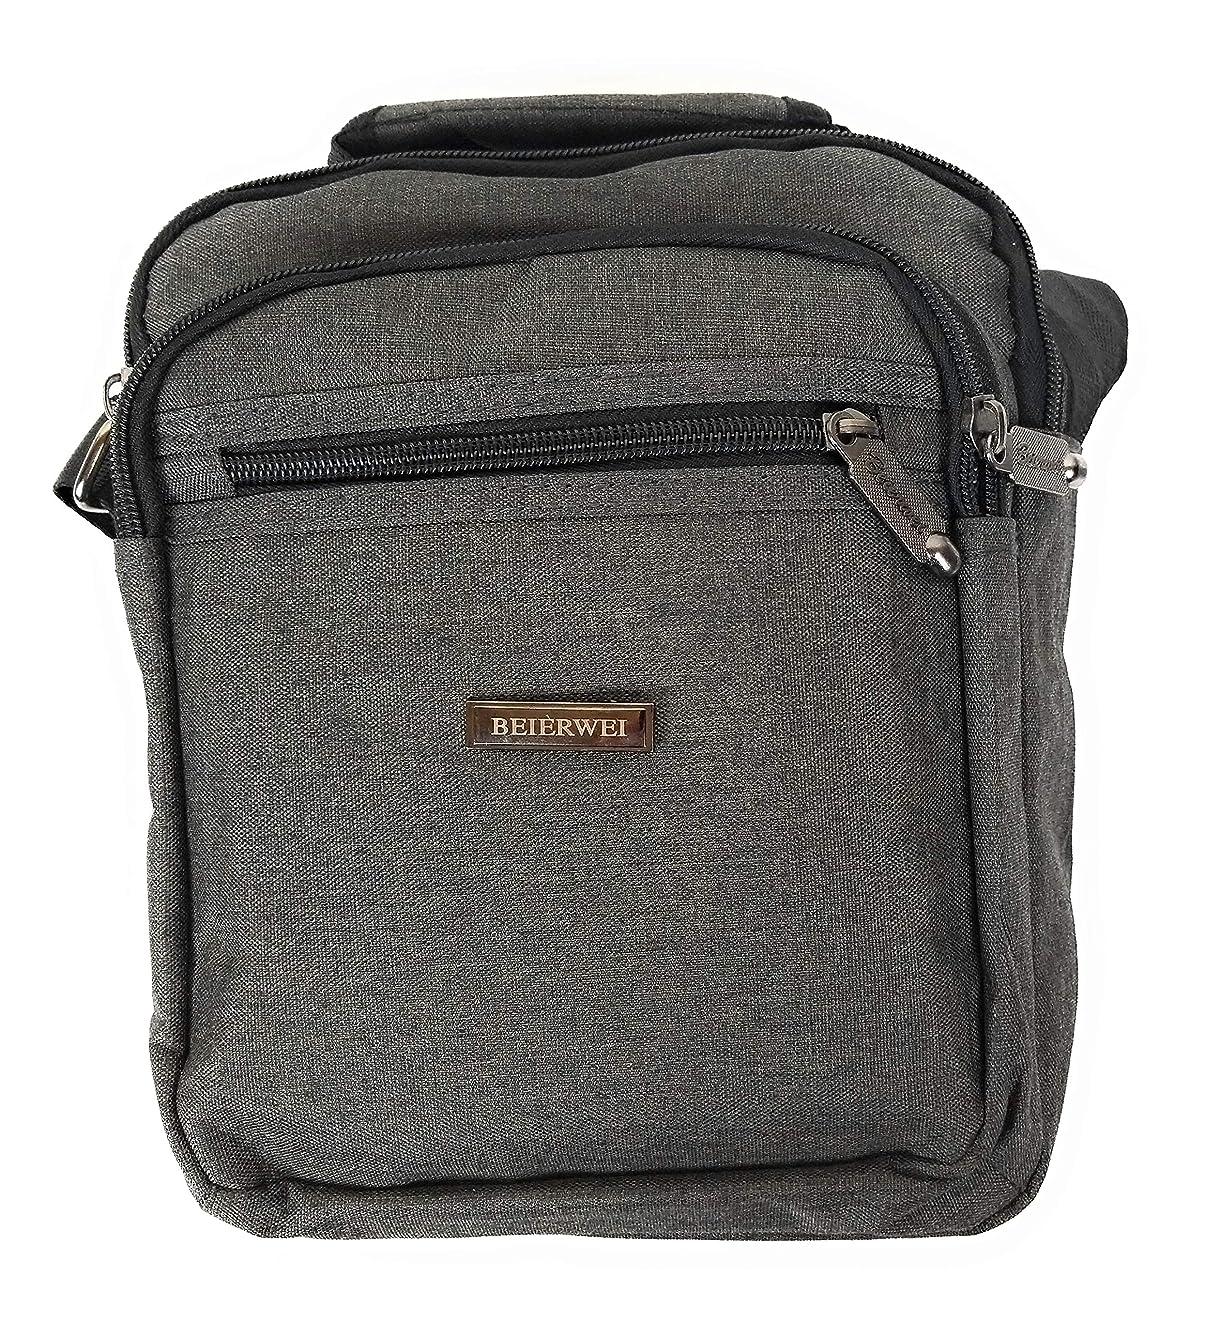 Canvas Messenger Sling Crossbody Bag Satchel Perfect for iPad Mini, Kindle, E-Readers Men Women Students (Smokey Grey)